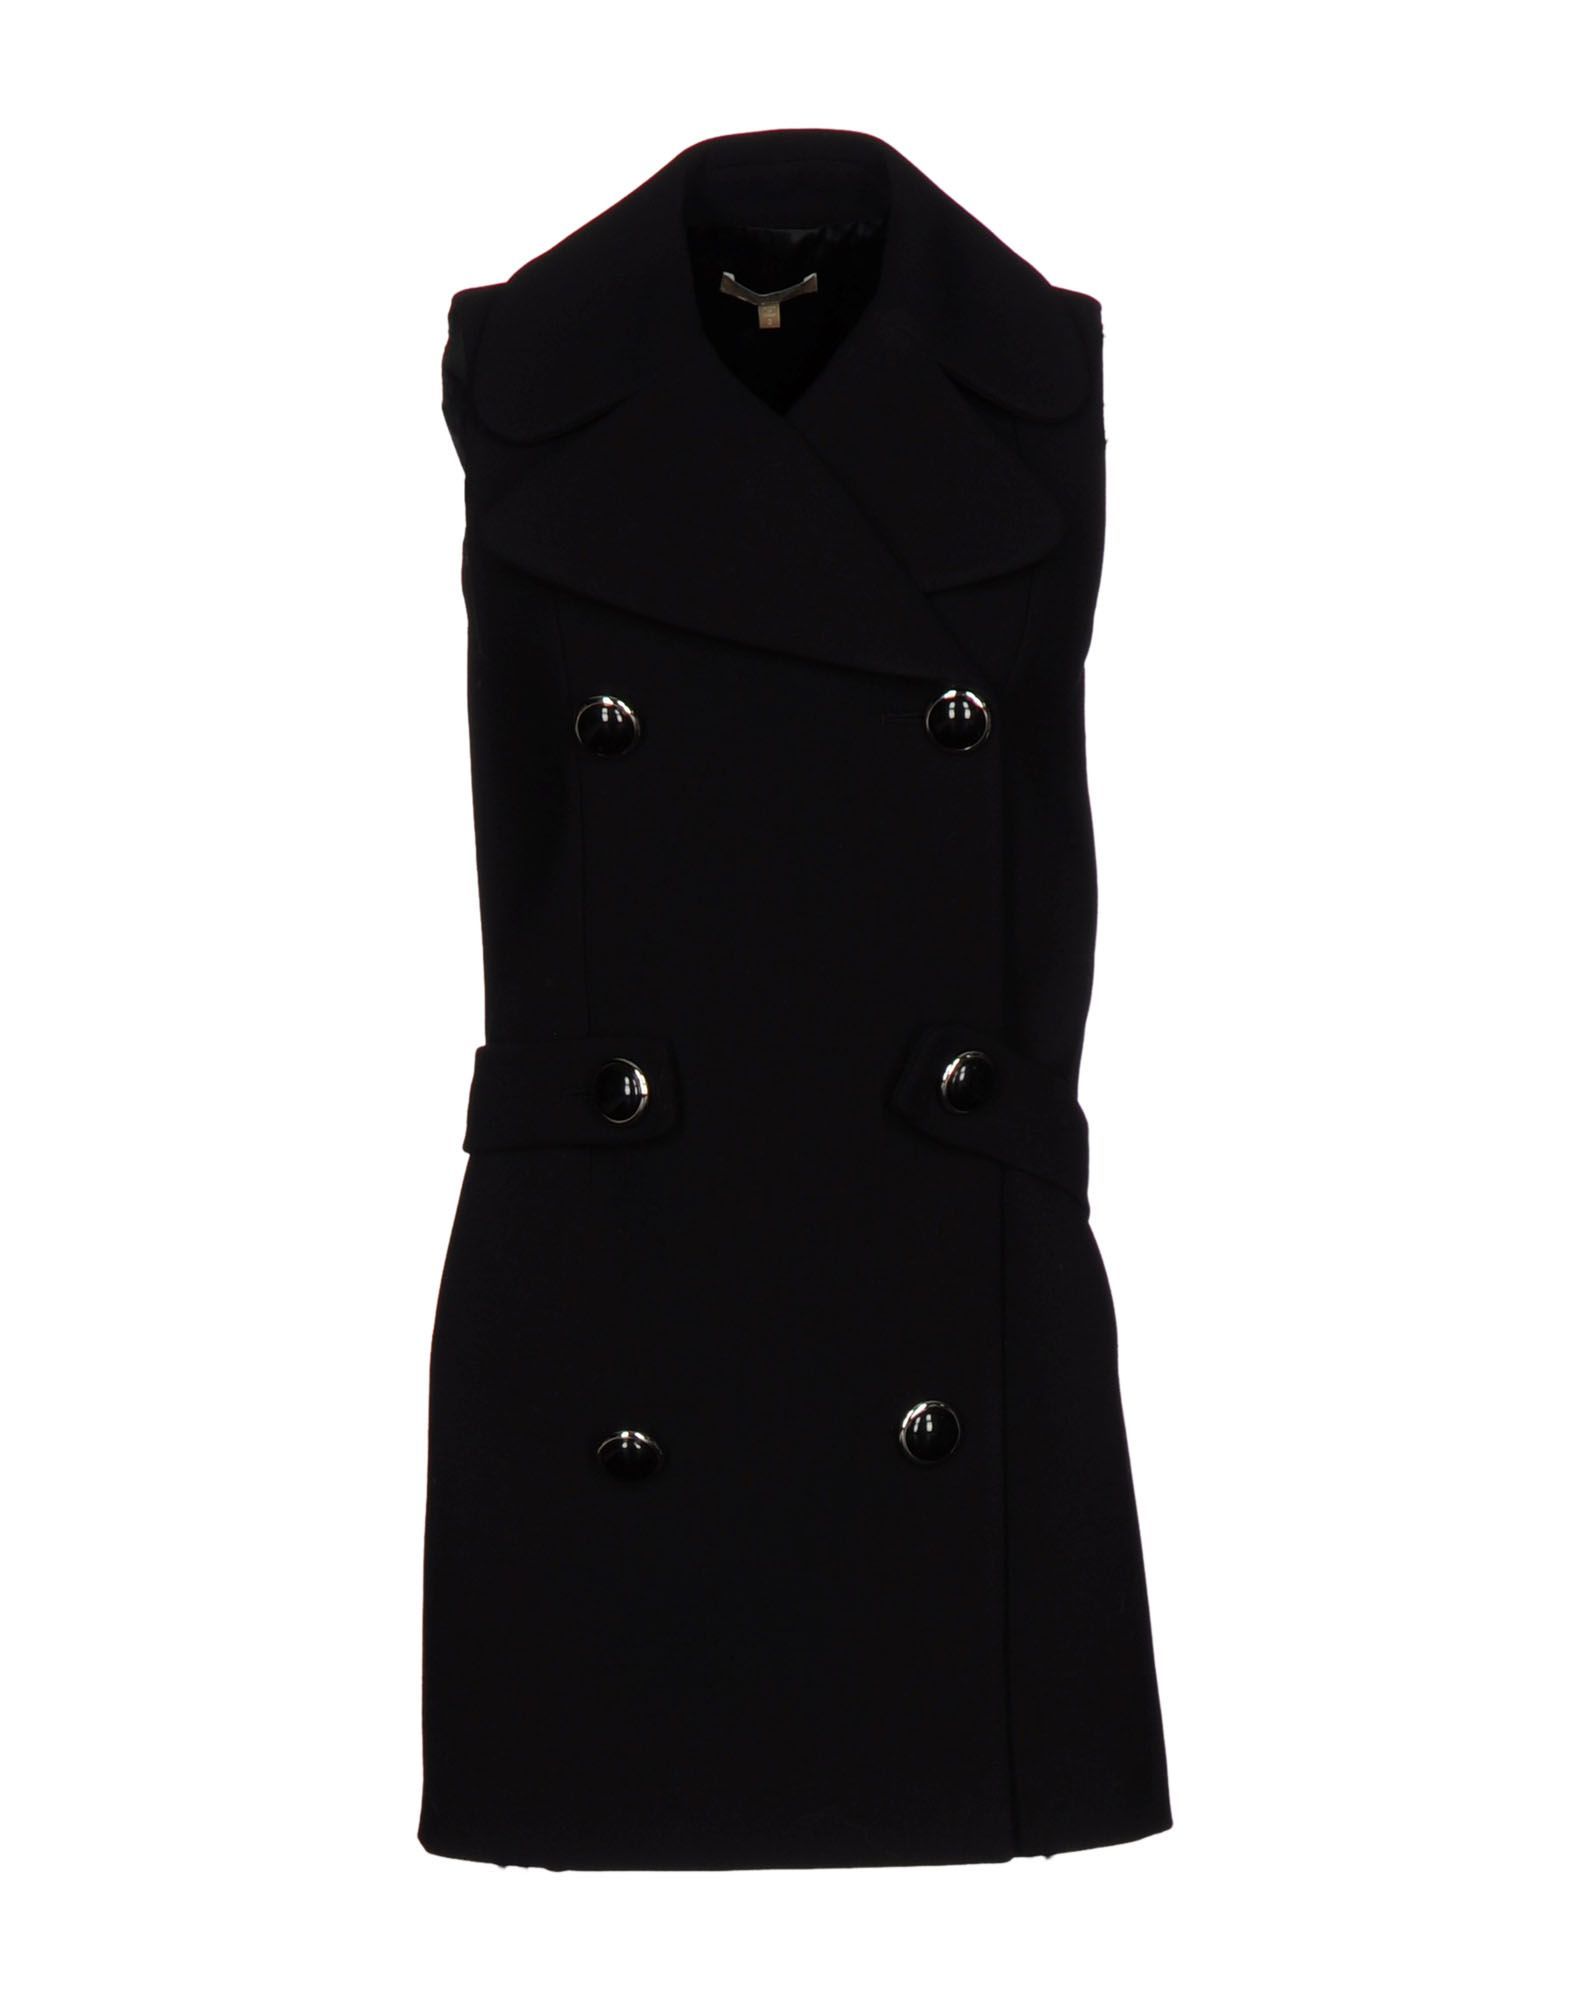 MICHAEL KORS COLLECTION Пальто michael kors collection пальто